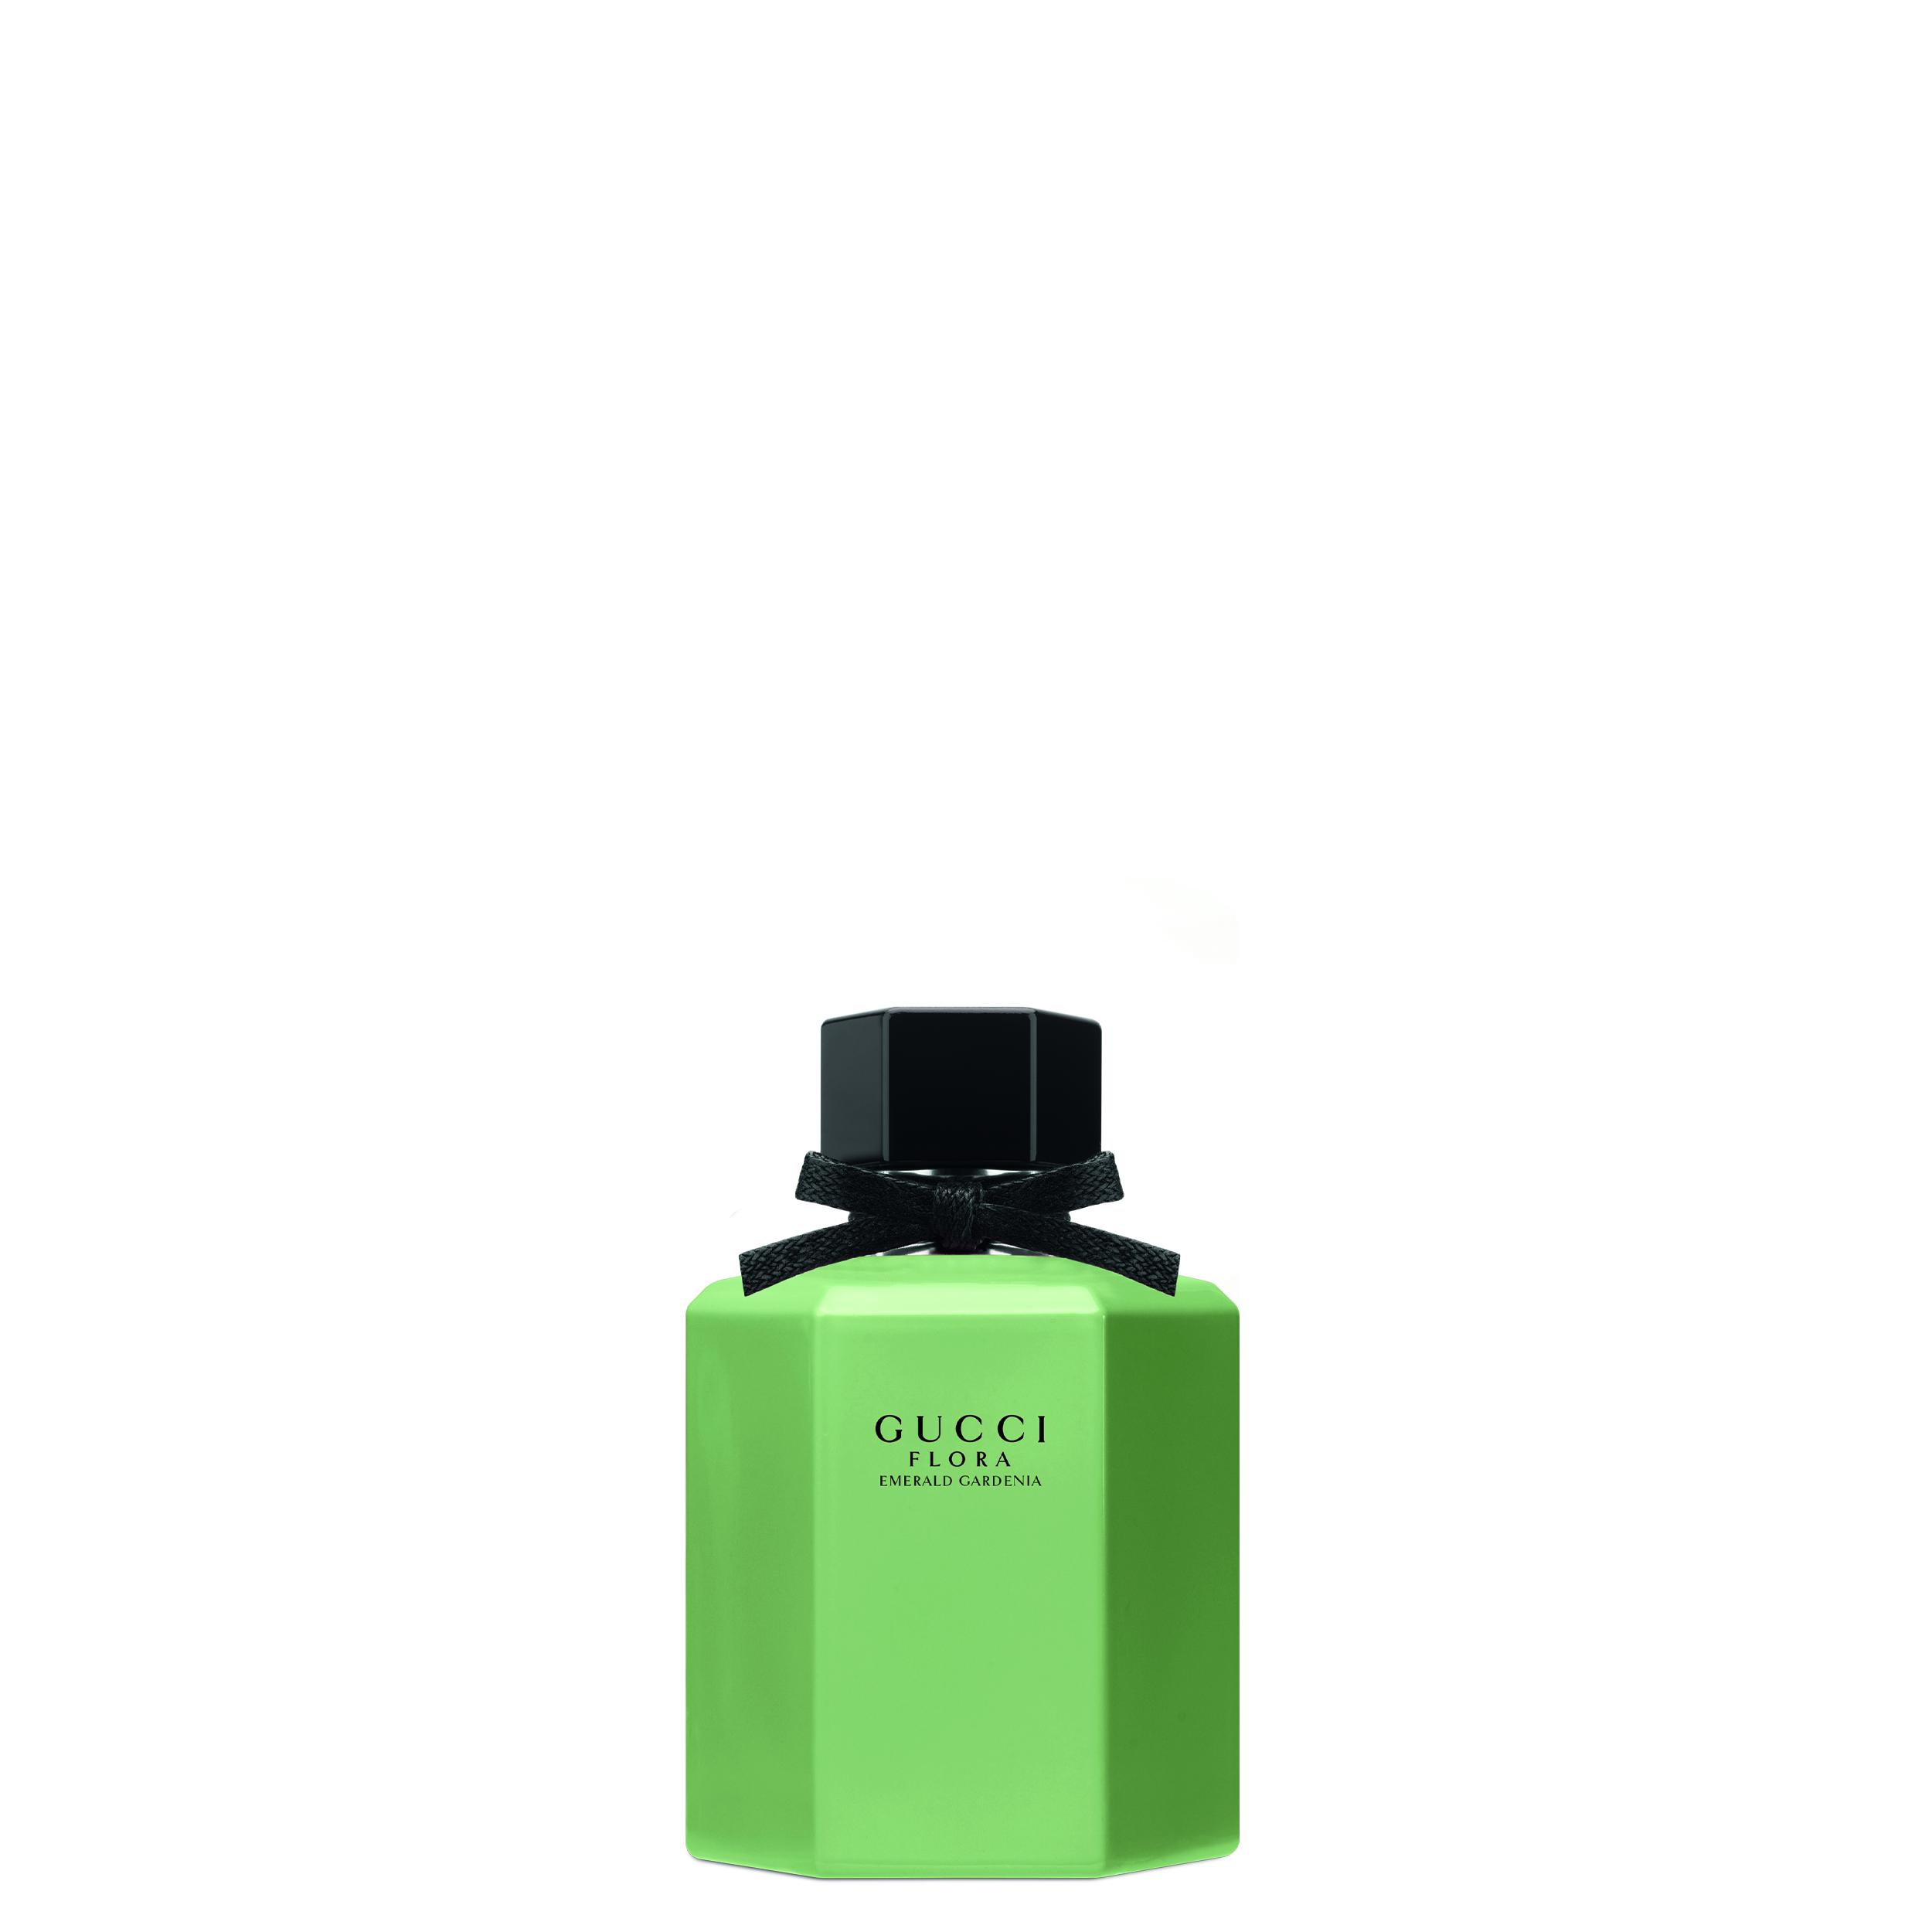 Flora Emerald Gardenia EdT 50 ml